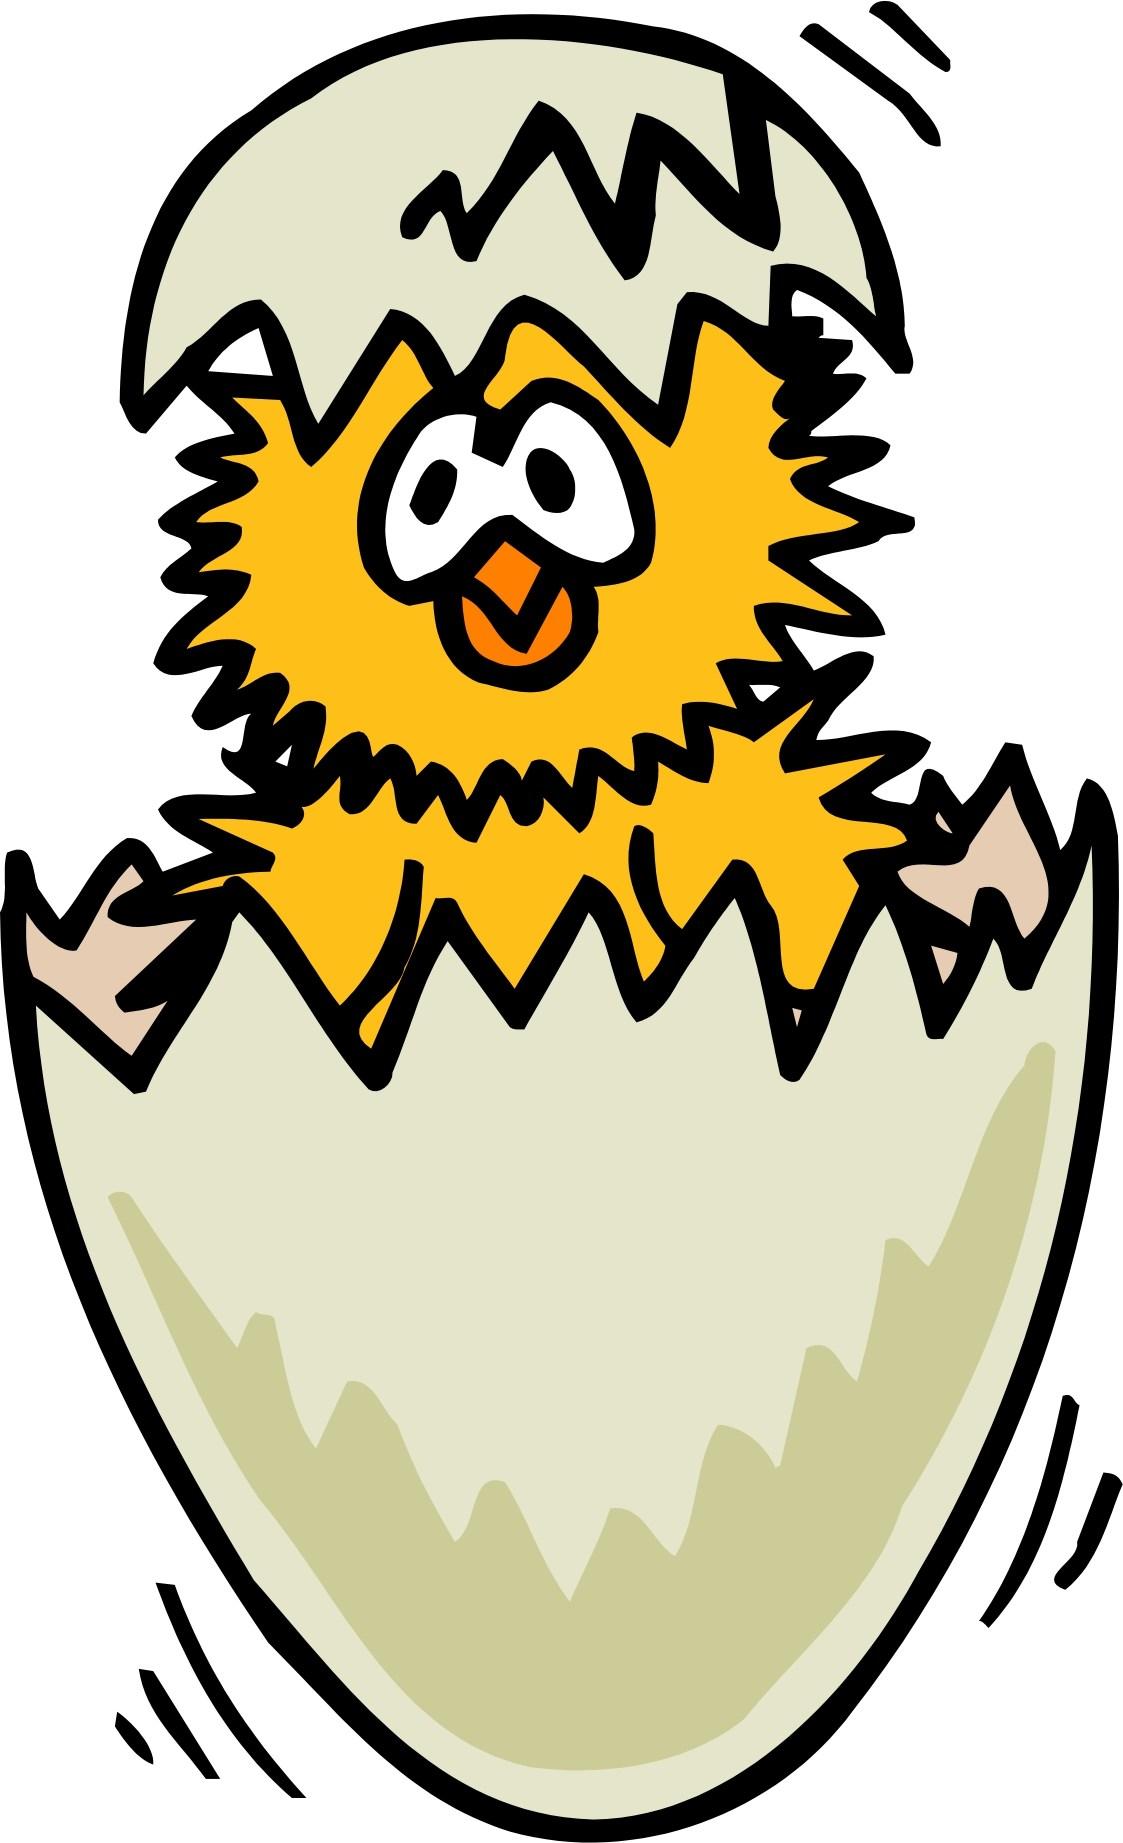 Hatch egg clipart 6 » Clipart Portal.